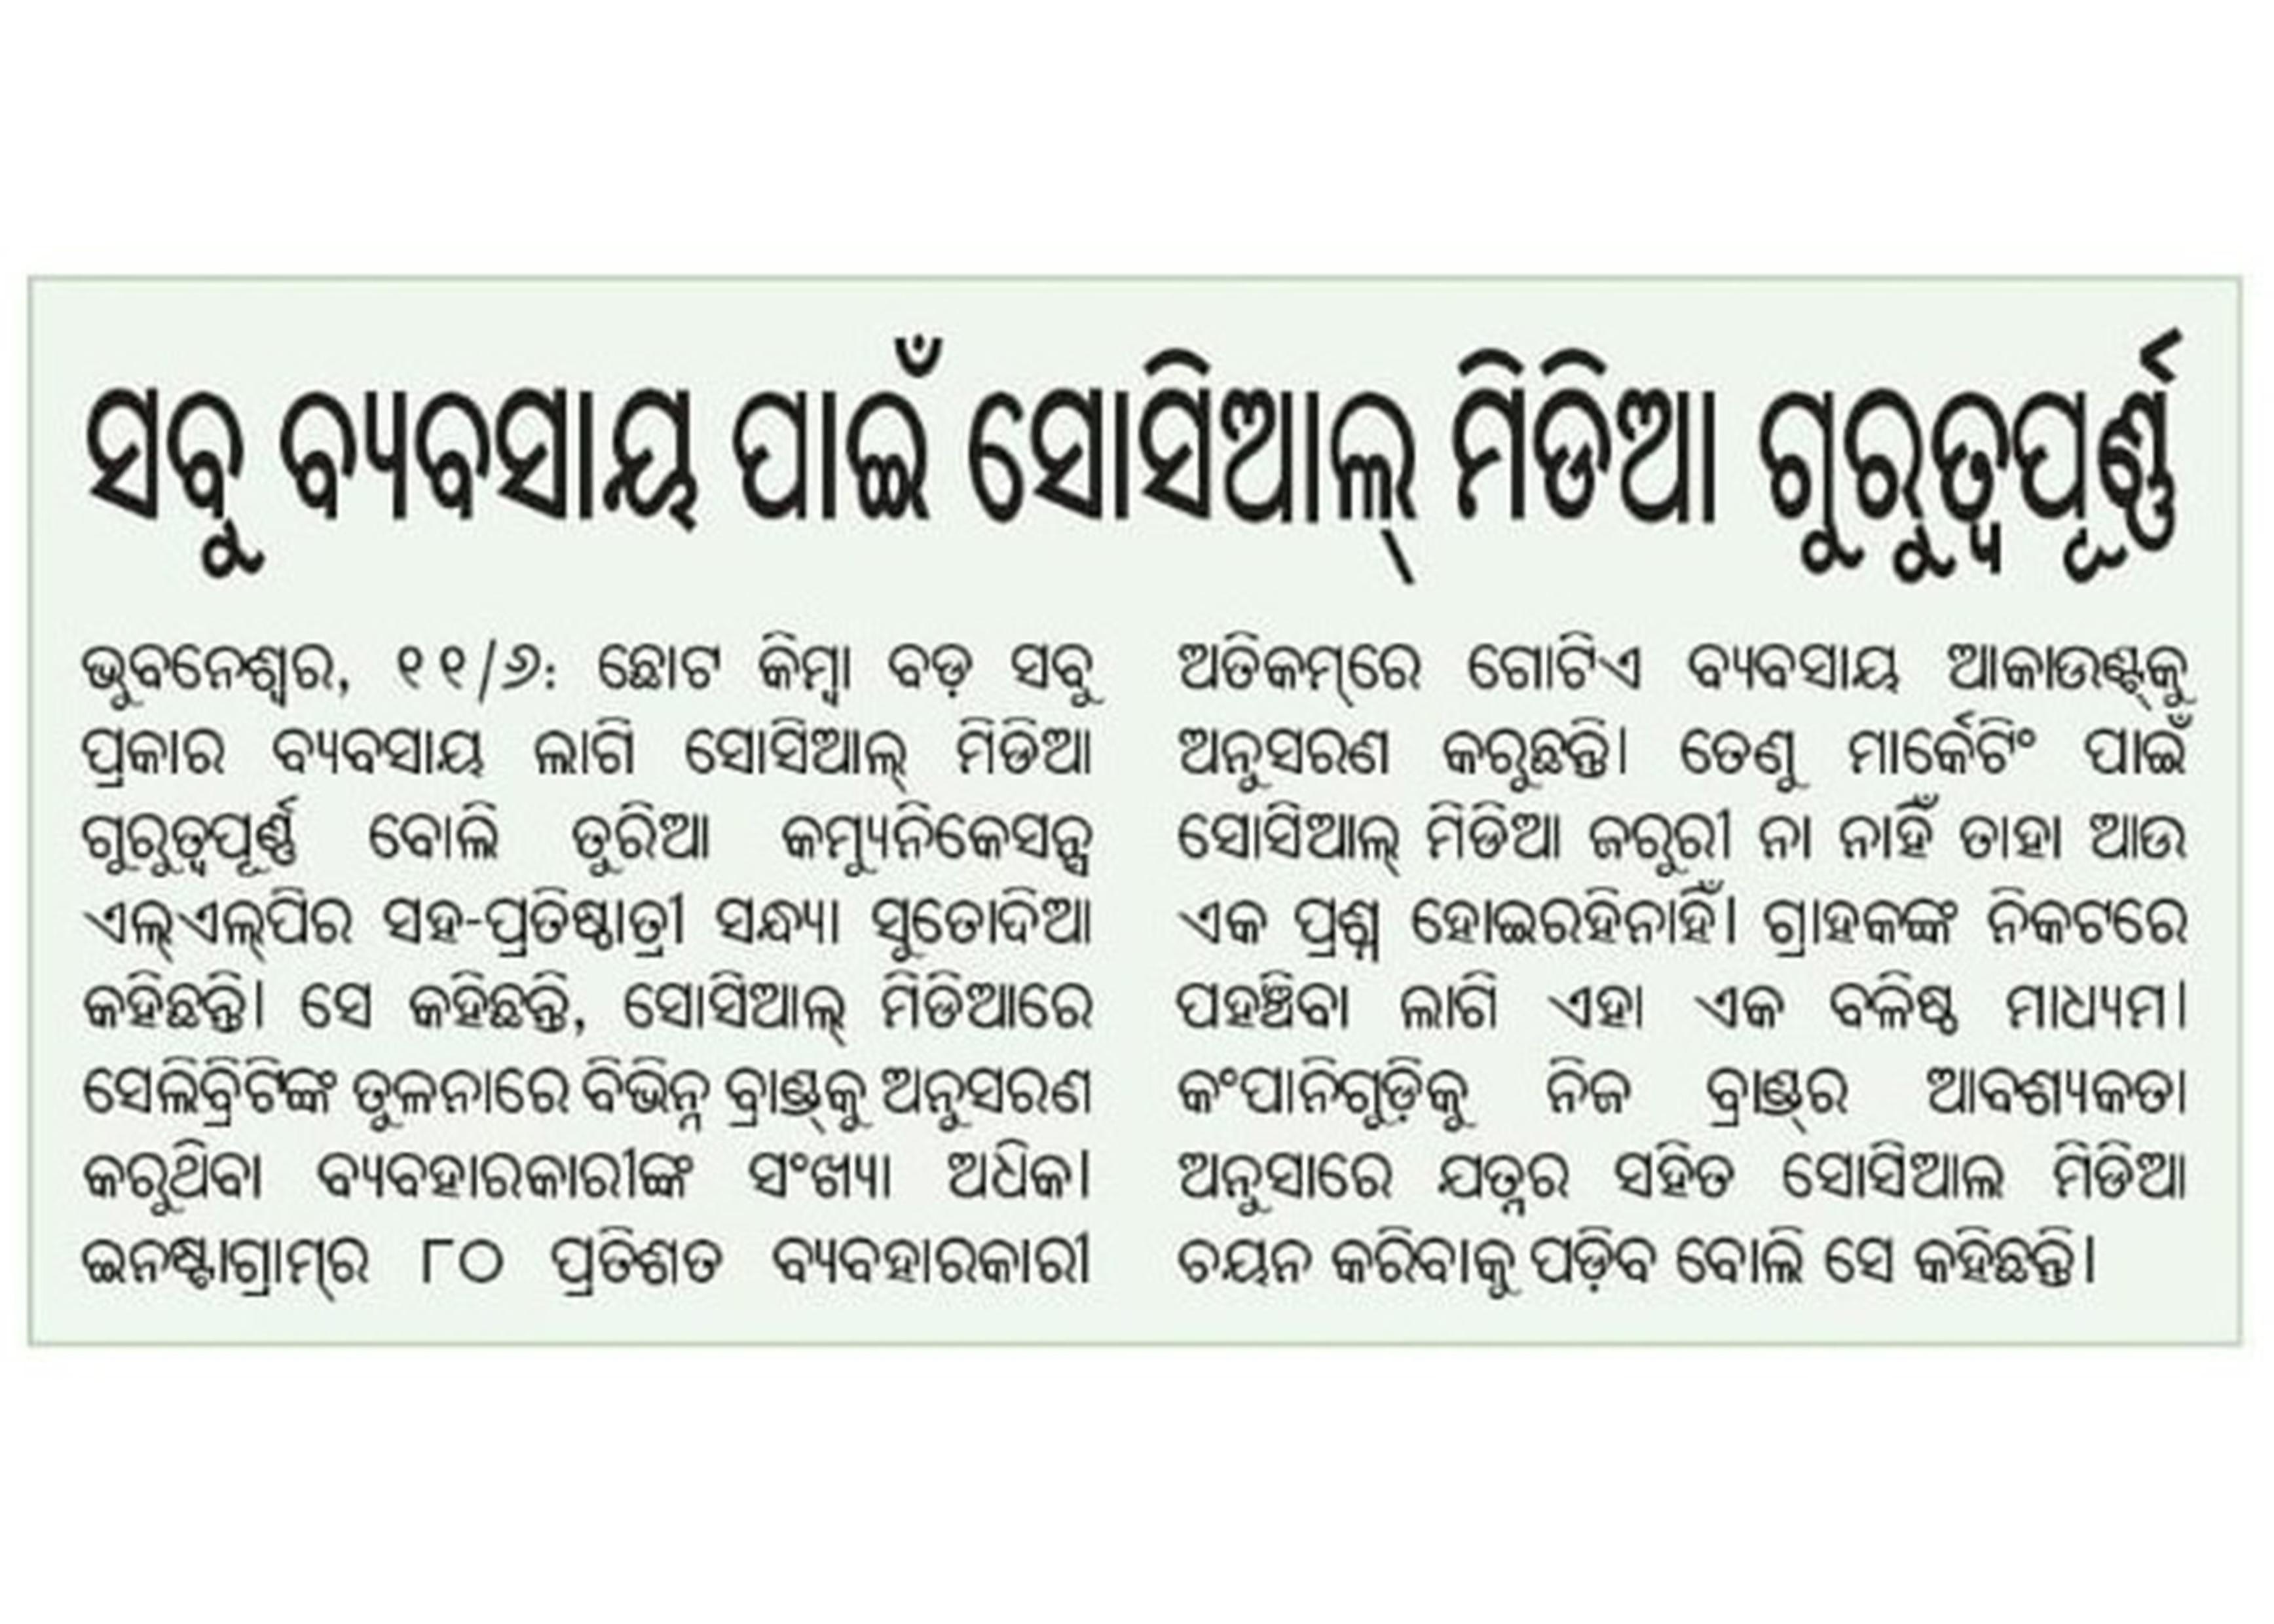 Sandhya Sutodia, Co-Founder's article on Sambad Daily